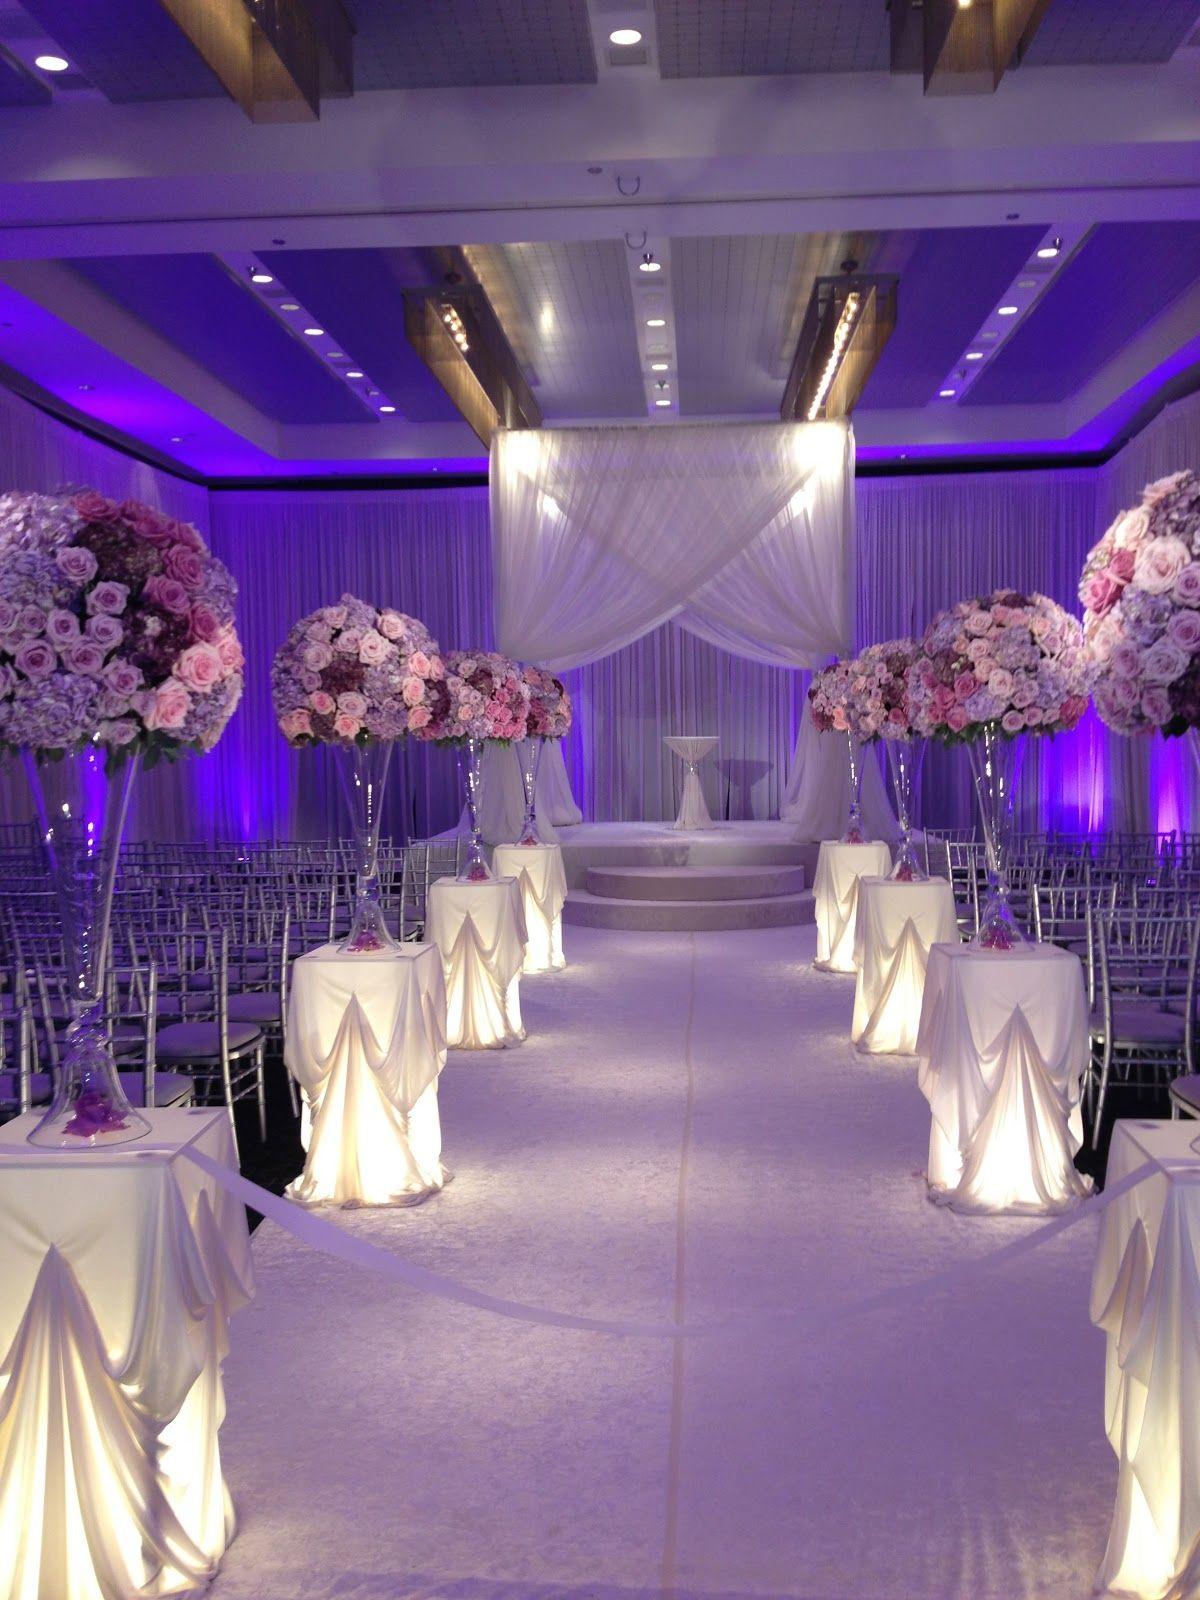 Beautiful Aisle Platinum And Plum Just Gorgeous The Wedding